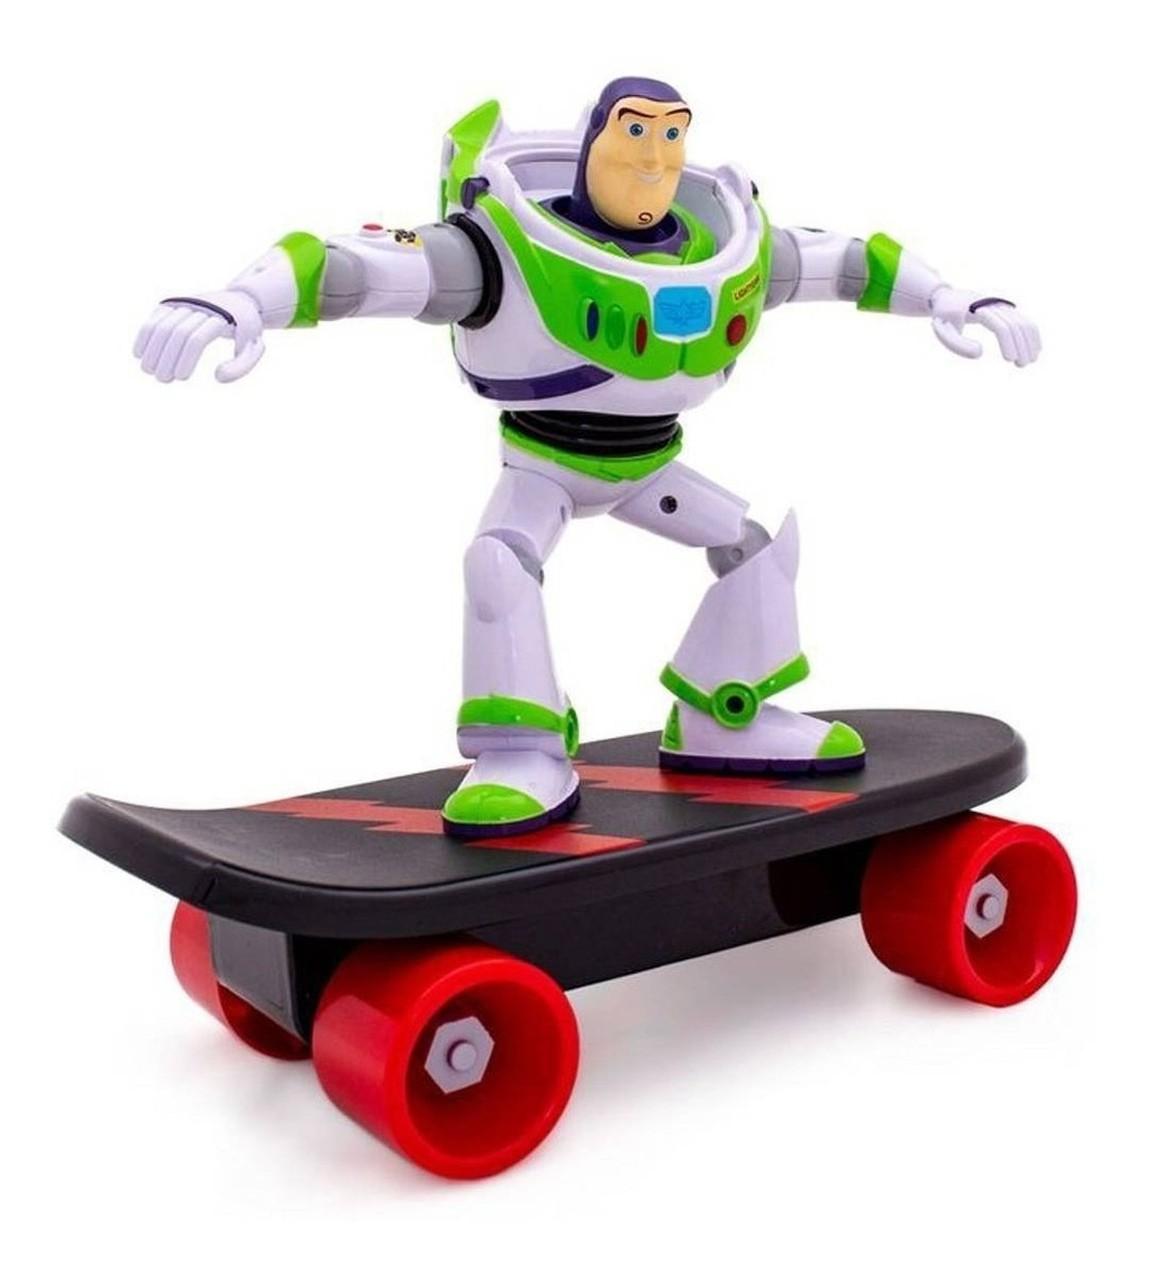 Toy Story Boneco Buzz Lightear Skate Radical Friccção - Toyng